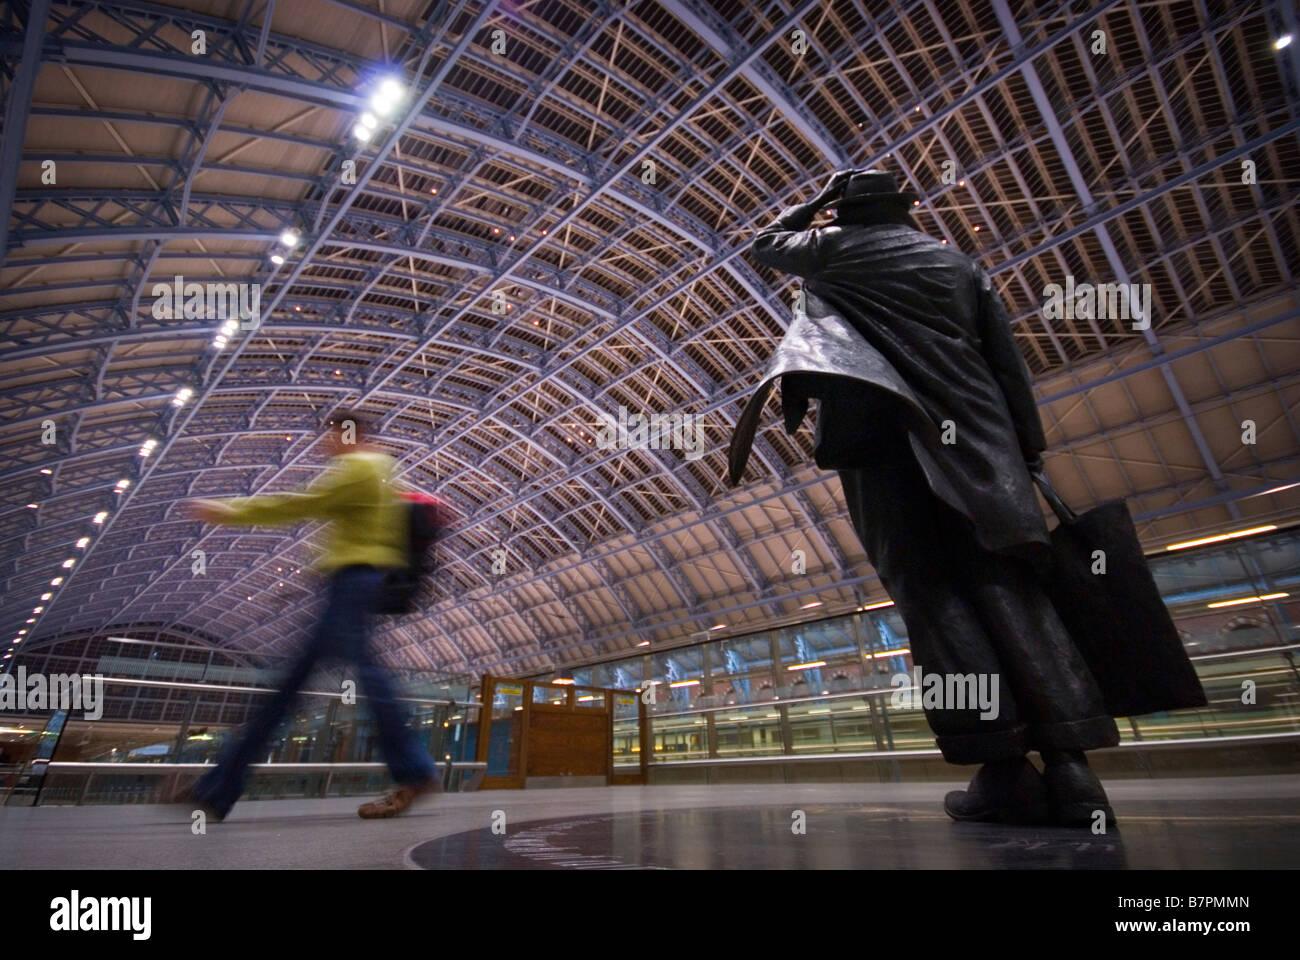 St. Pancras International Station, in November 2008. - Stock Image